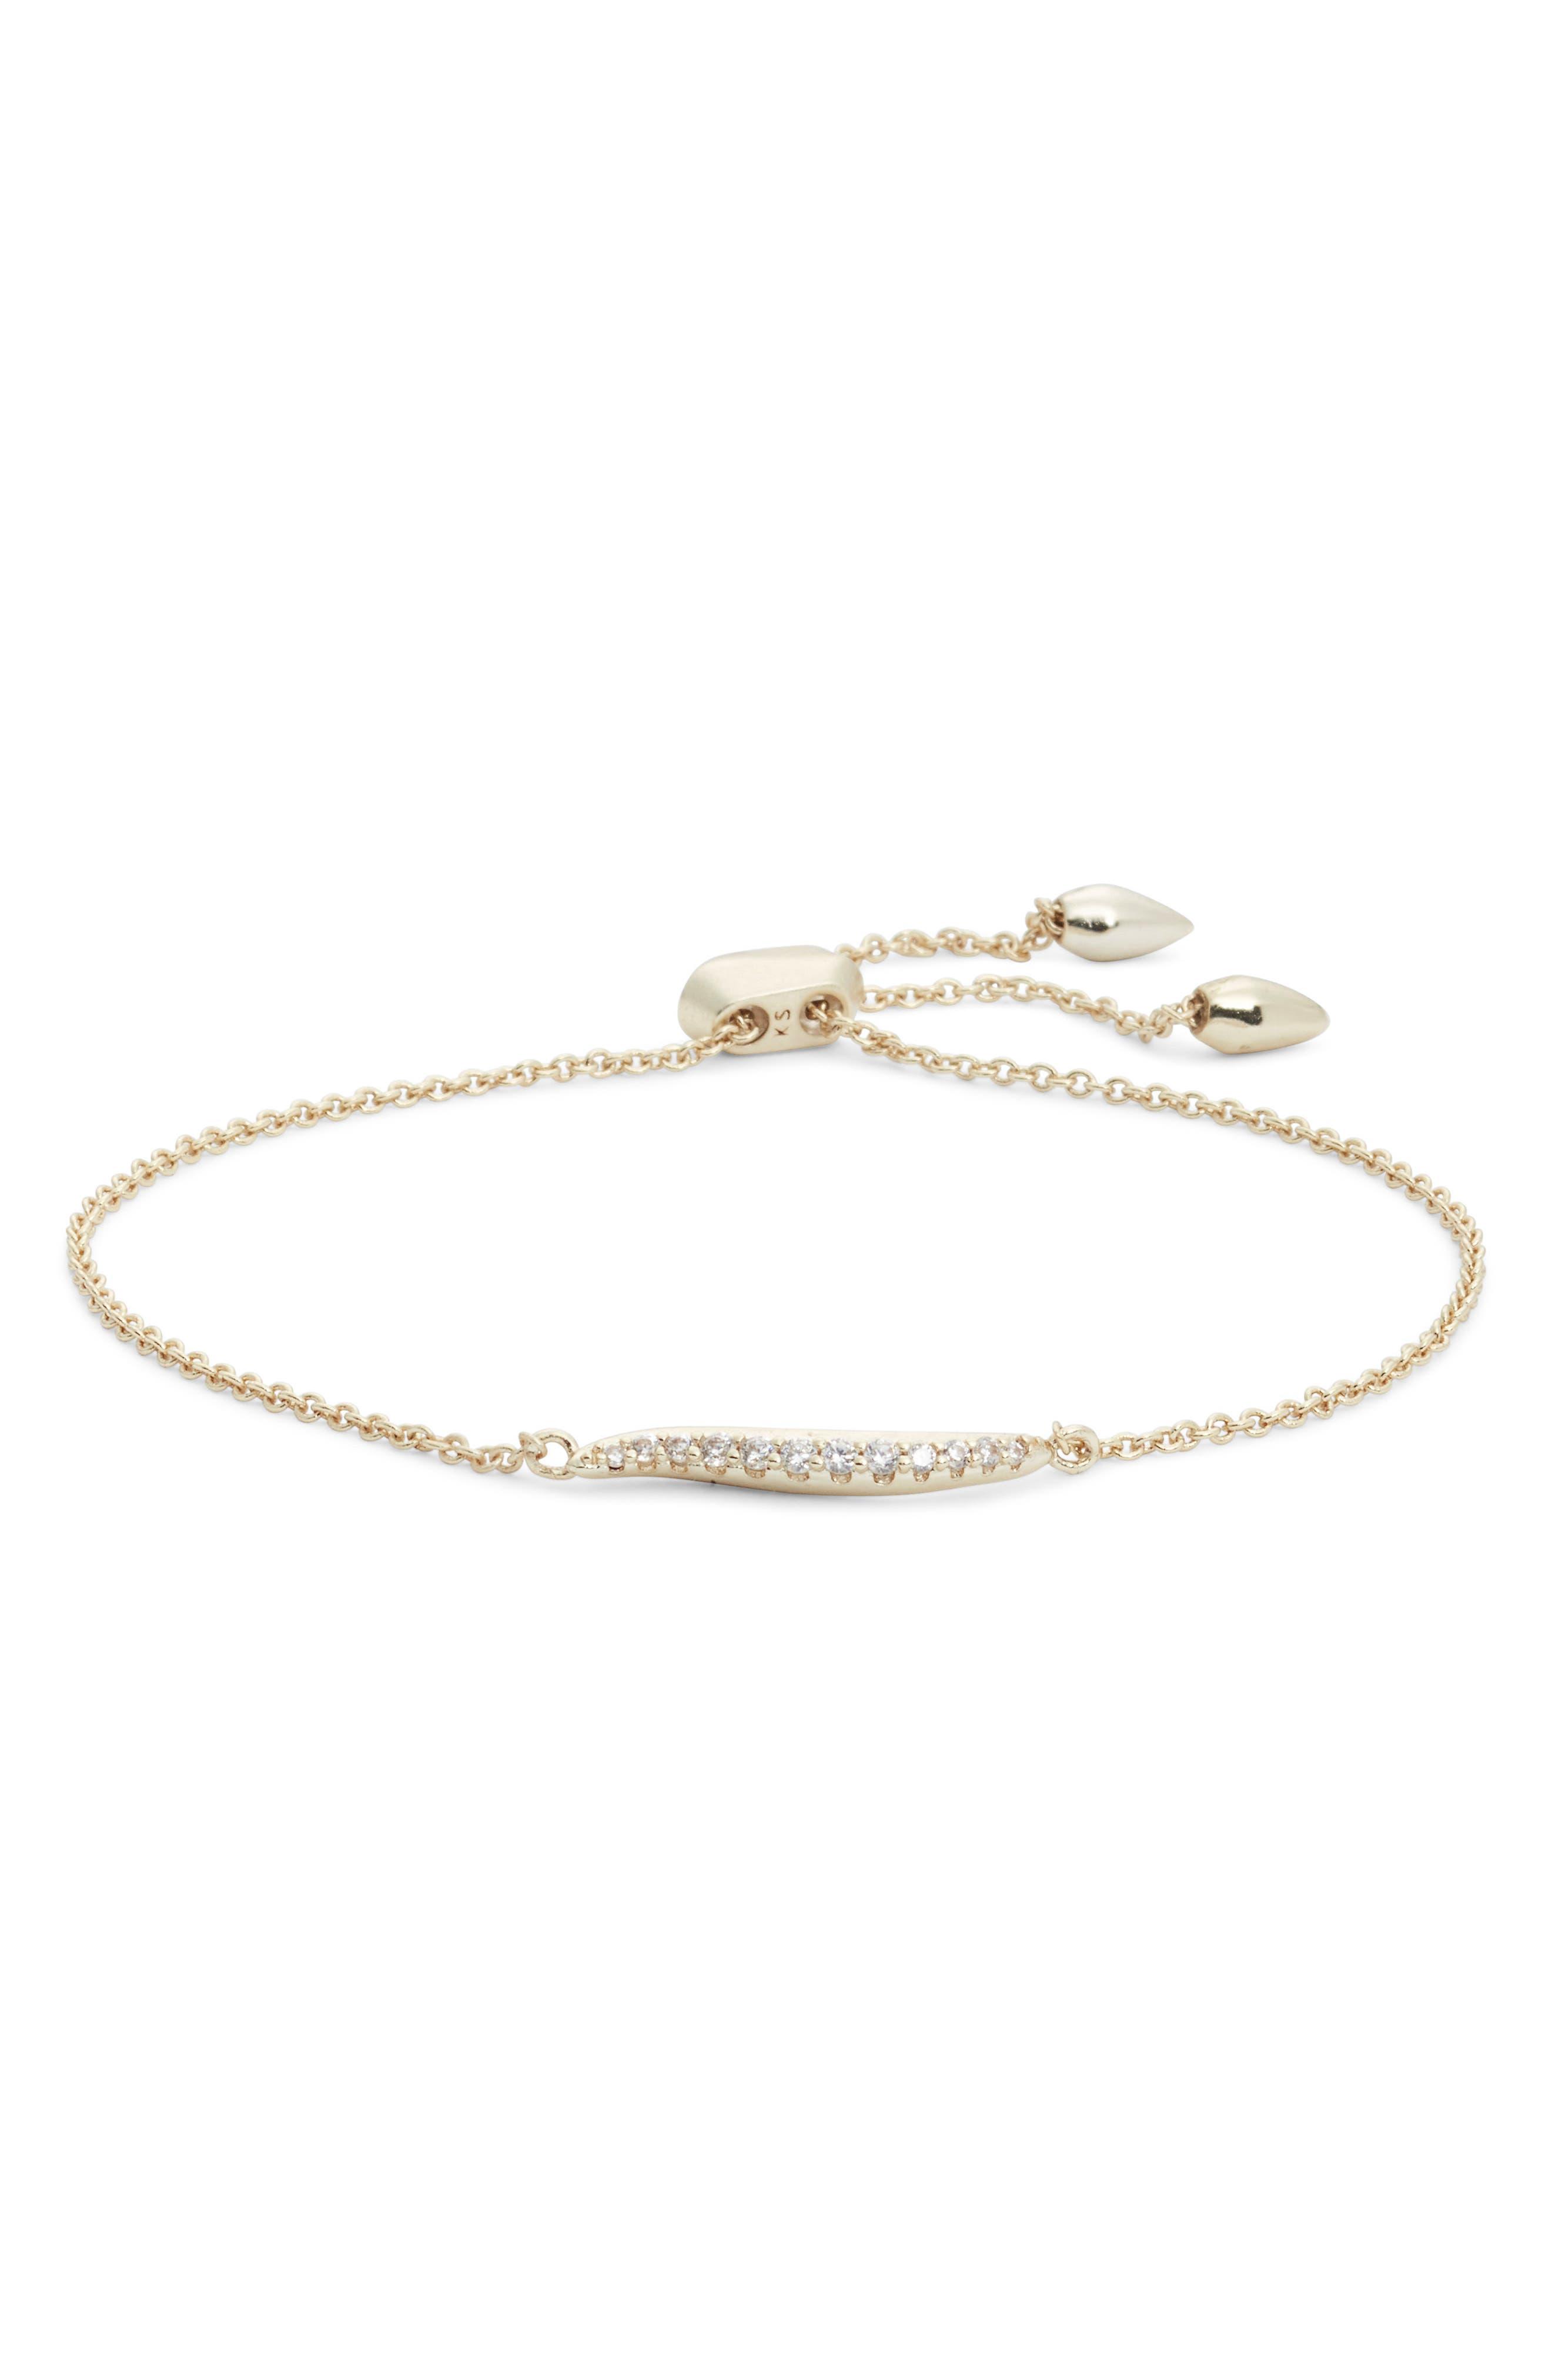 Jemmina Adjustable Bracelet,                             Main thumbnail 1, color,                             GOLD